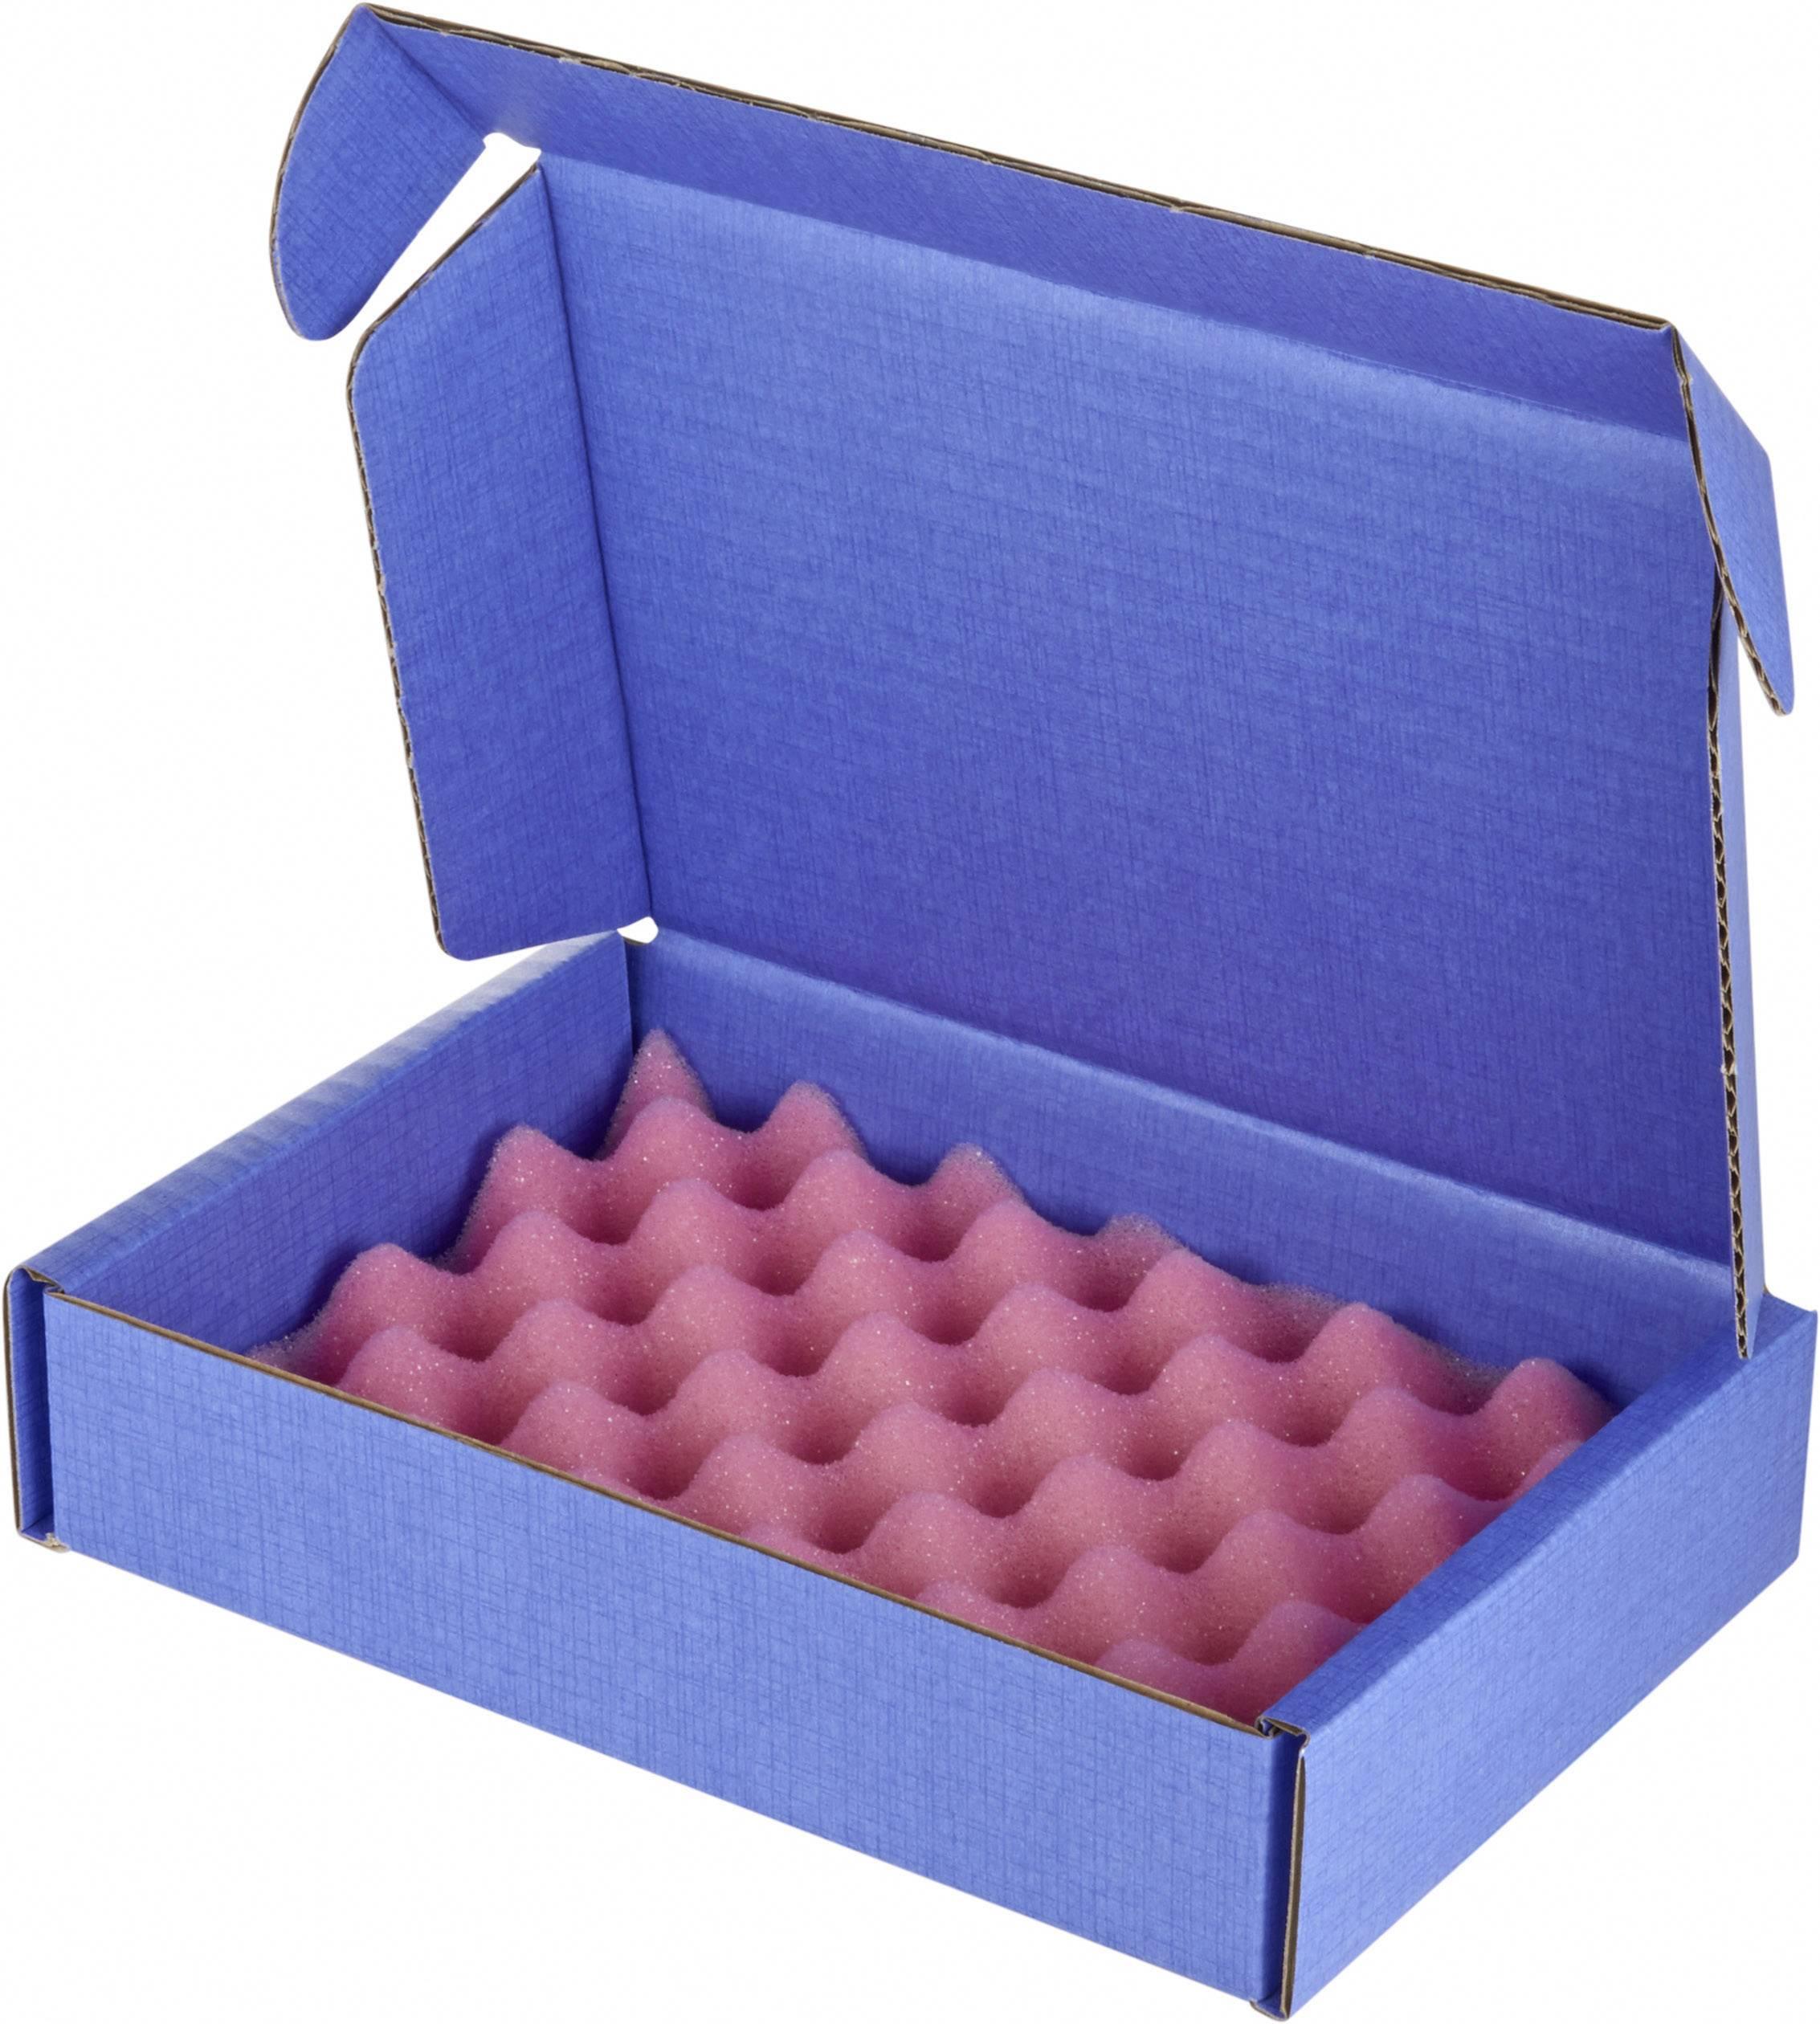 ESD krabica Wolfgang Warmbier 5510.903.A20, (d x š x v) 183 x 127 x 38 mm, modrá